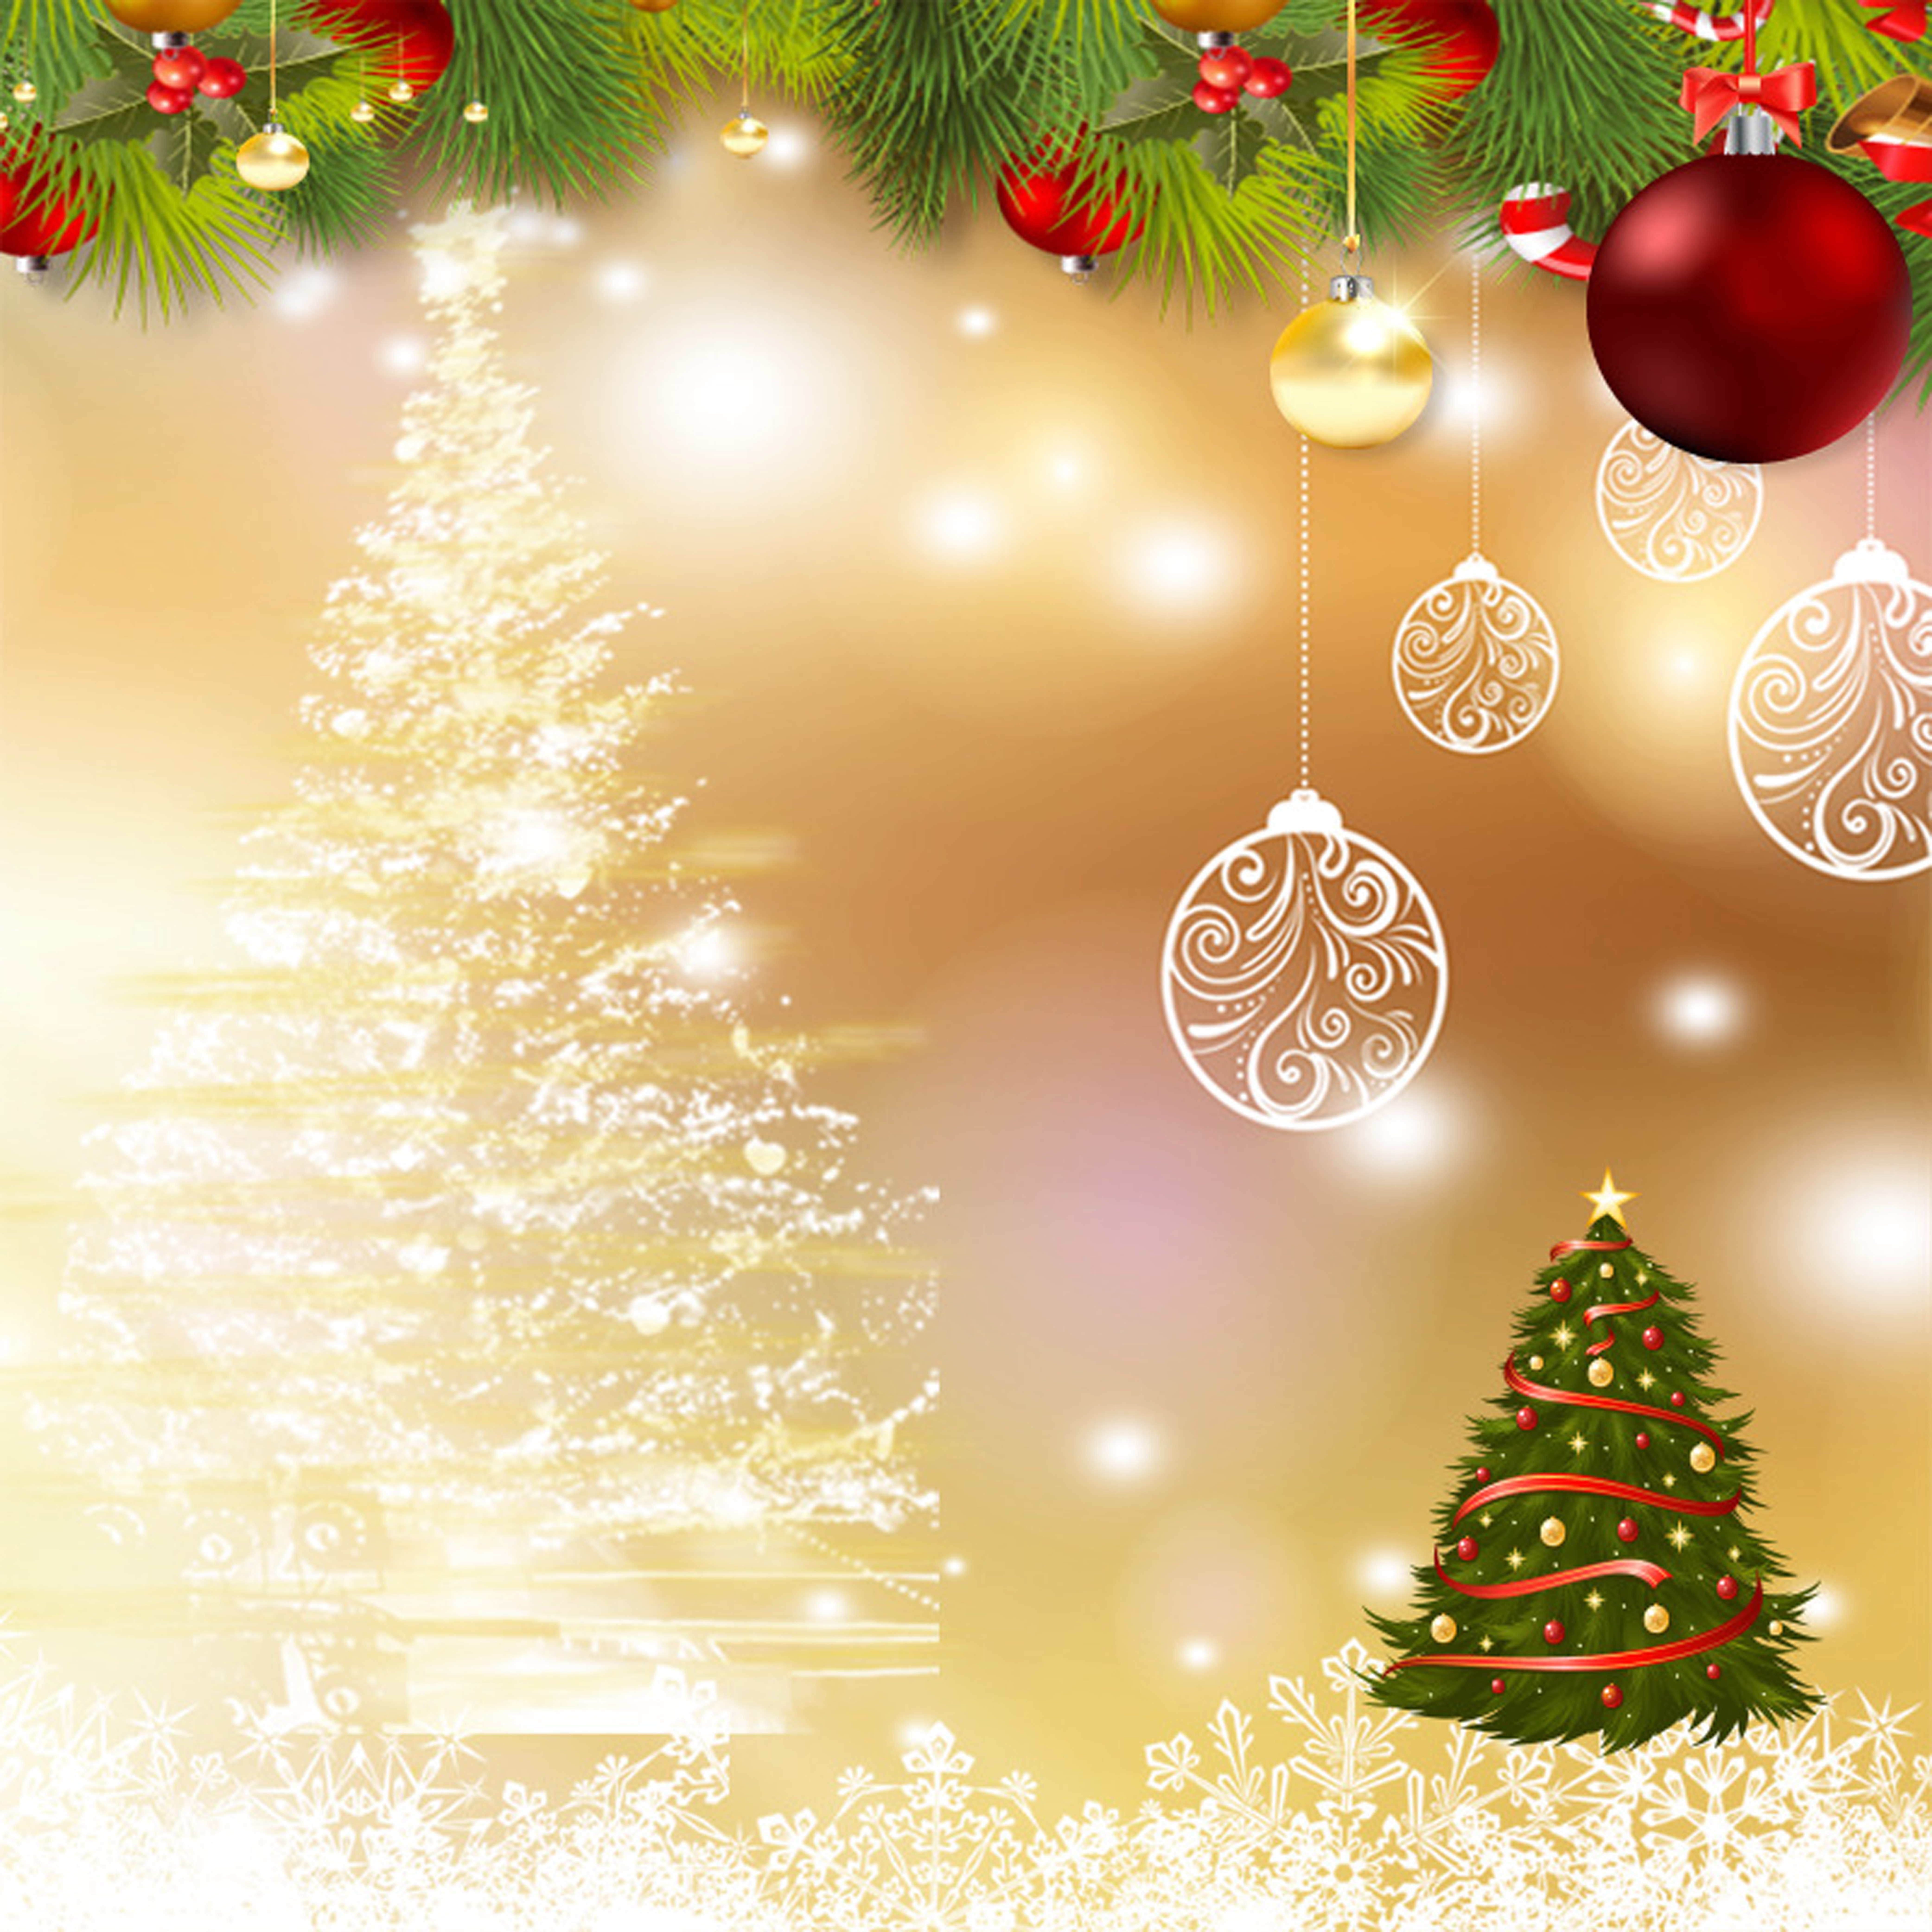 Christmas beautiful background christmas balls tree for Natale immagini per desktop